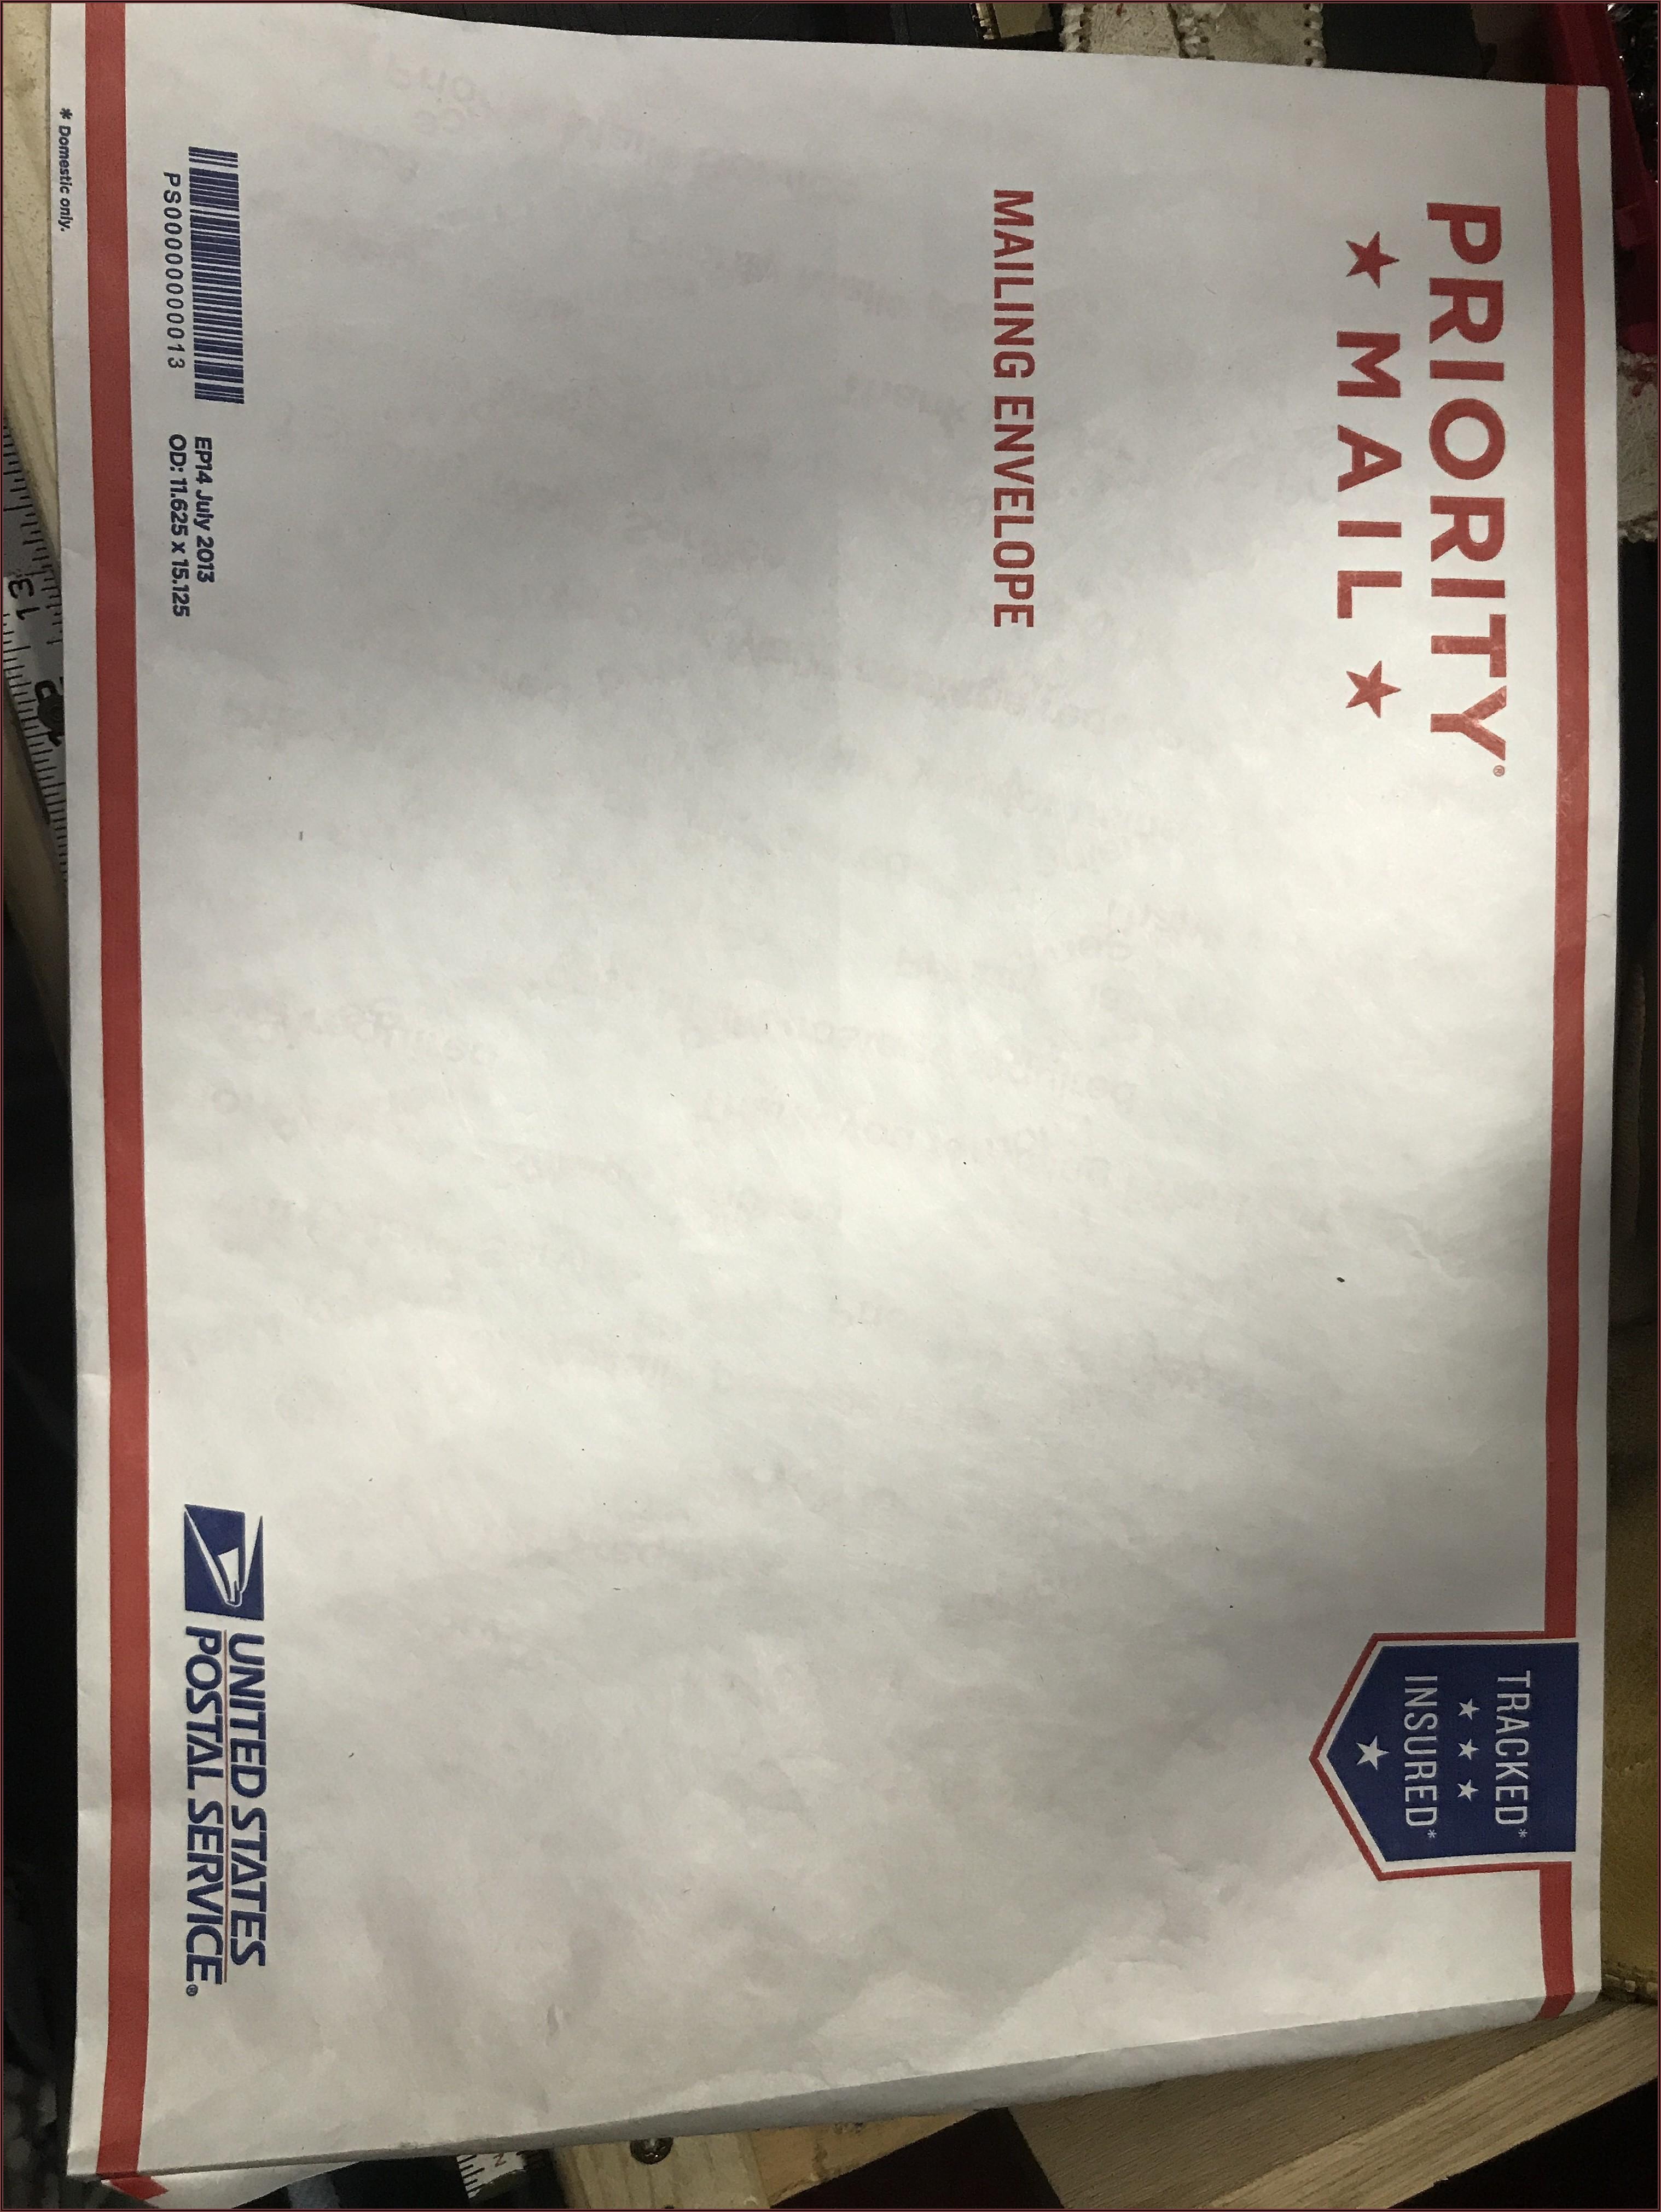 Usps Prepaid Envelope Sizes